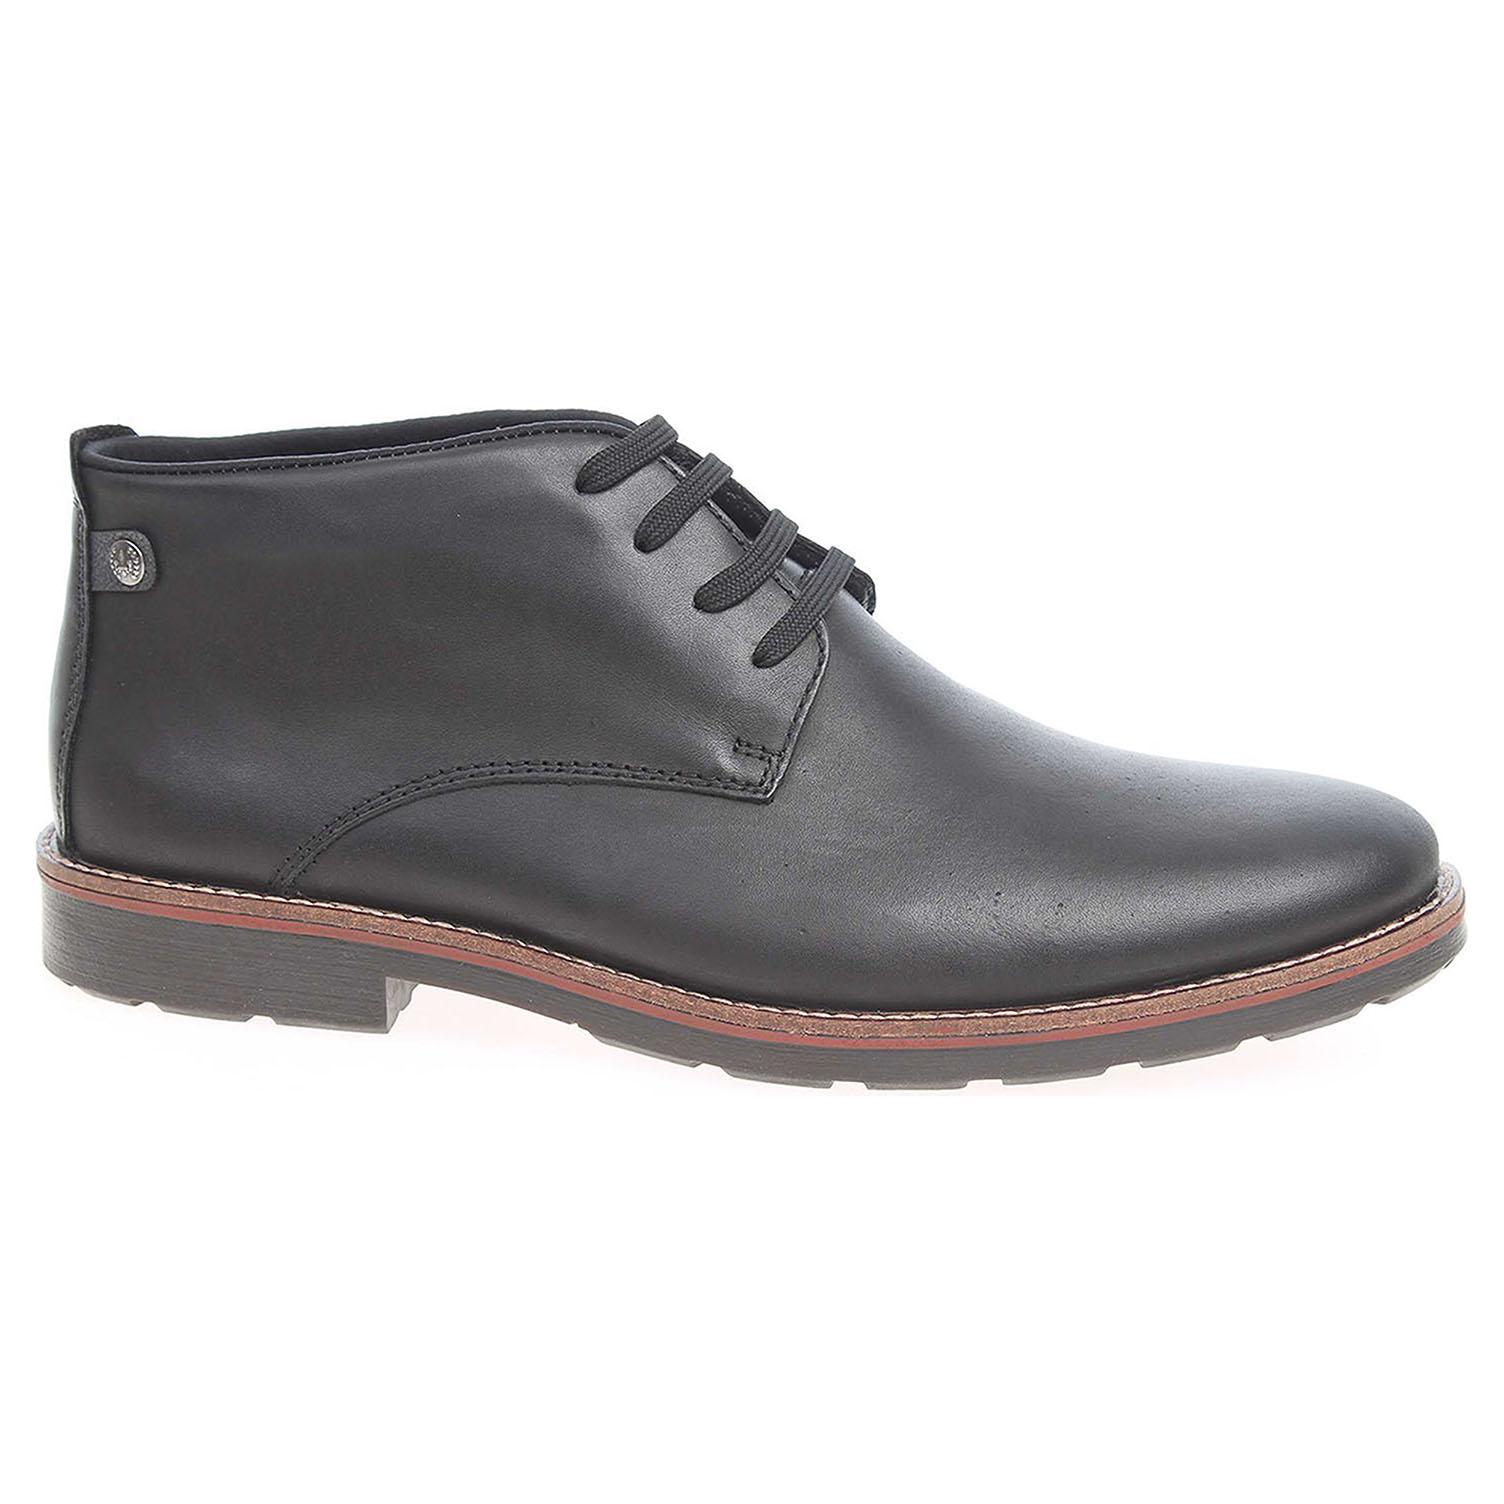 2799acfb1cd26 Pánská kotníková obuv Rieker 15340-00 schwarz | Rejnok obuv